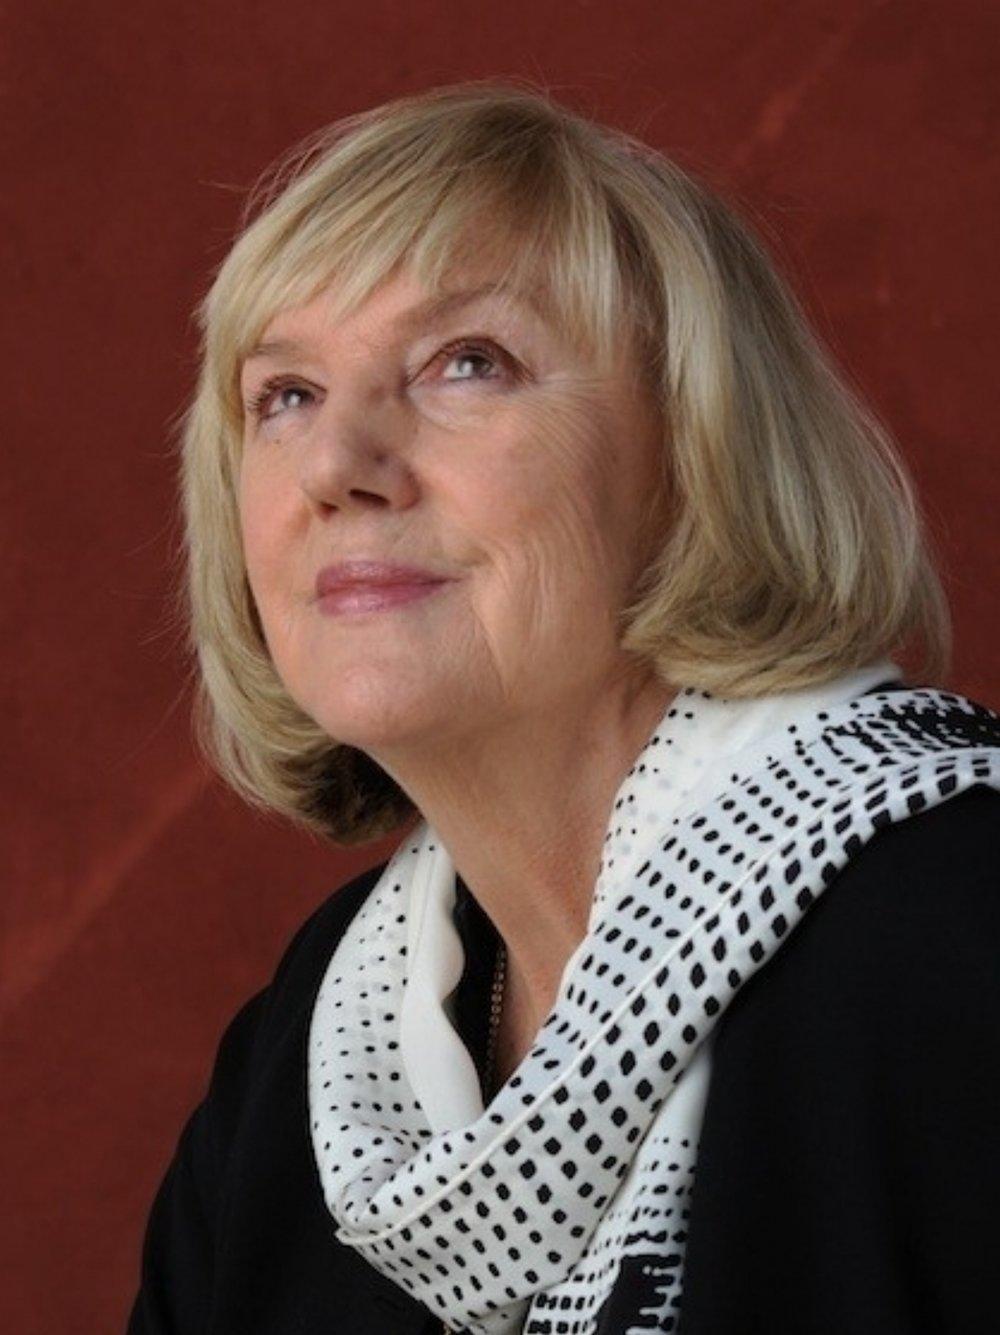 Dr. Francesca Valente